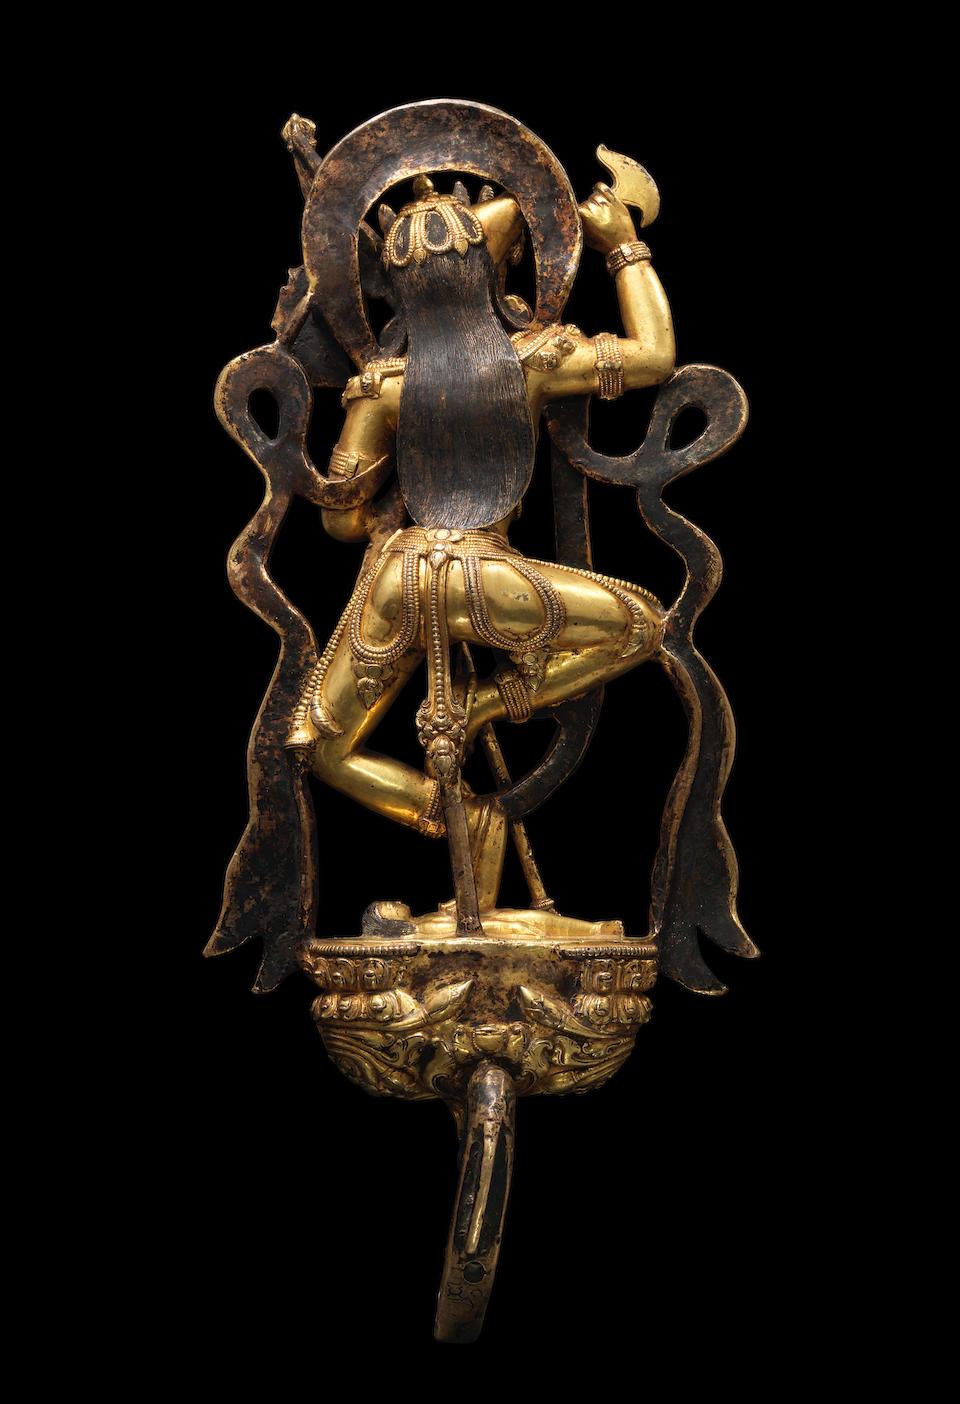 A GILT COPPER ALLOY FIGURE OF VAJRAVARAHI DENSATIL, 14TH CENTURY